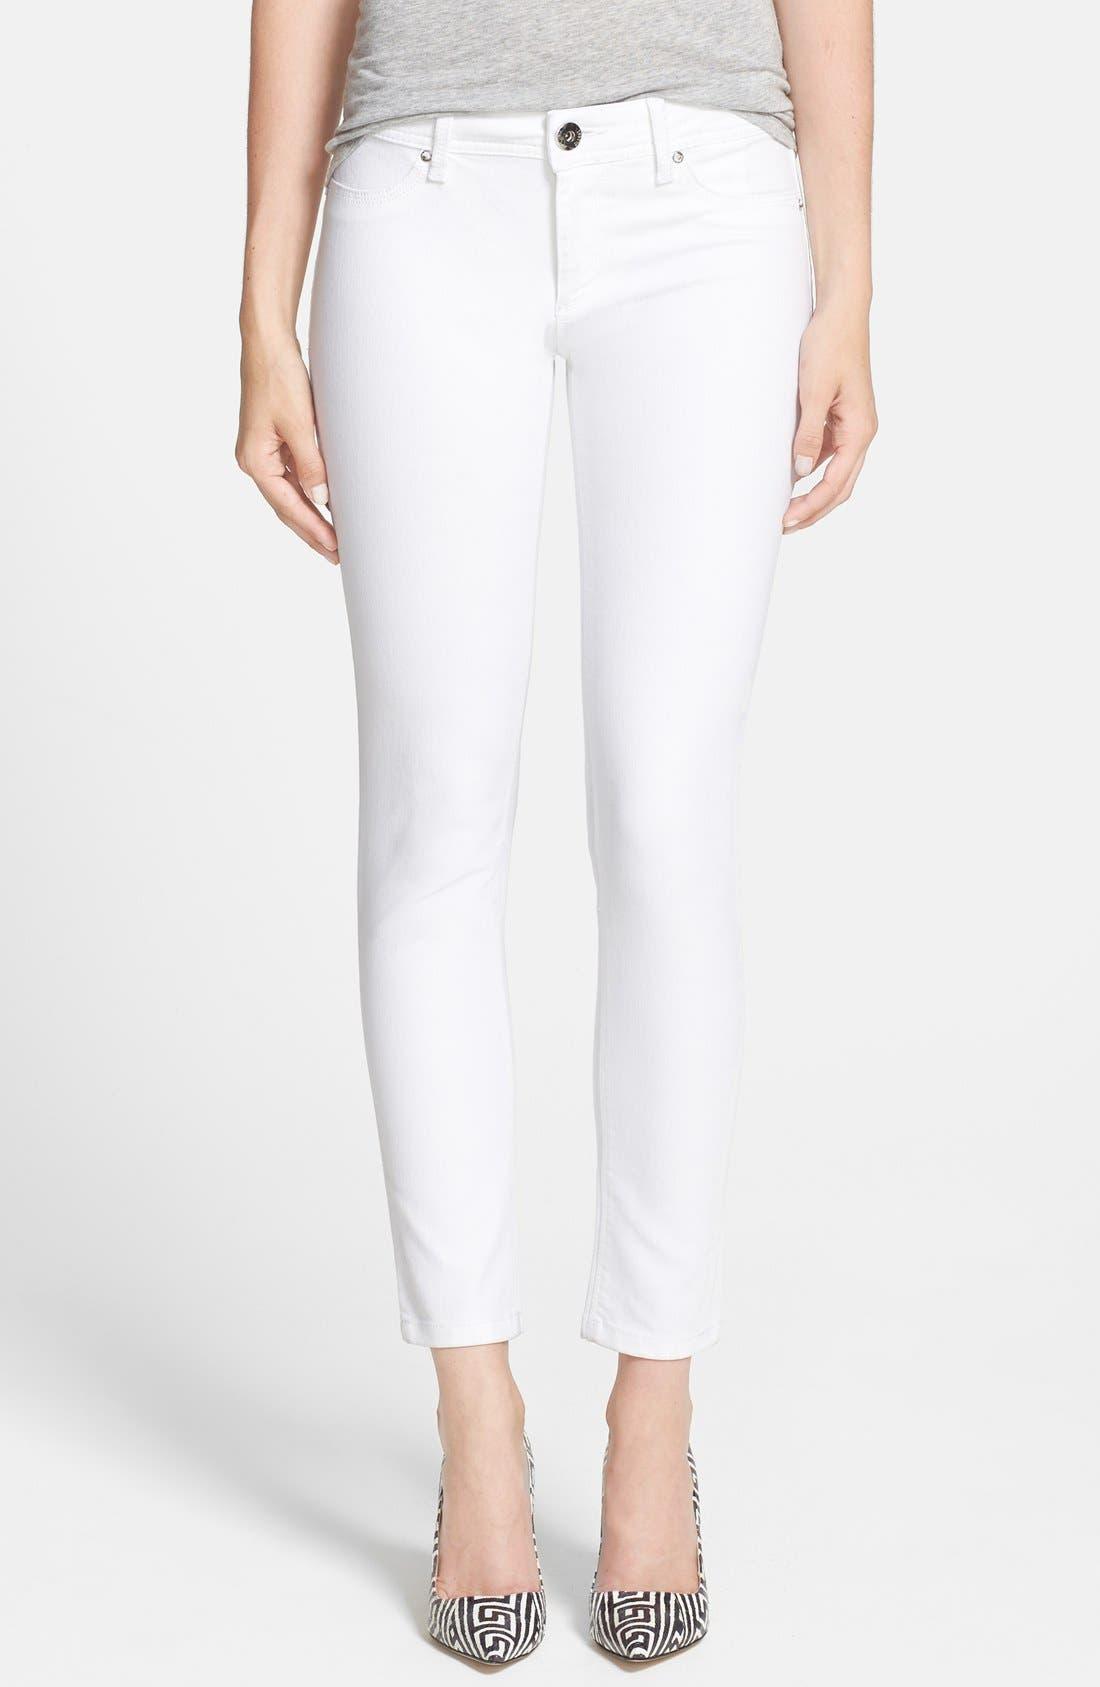 Alternate Image 1 Selected - DL1961 'Emma' Power Legging Jeans (Milk)